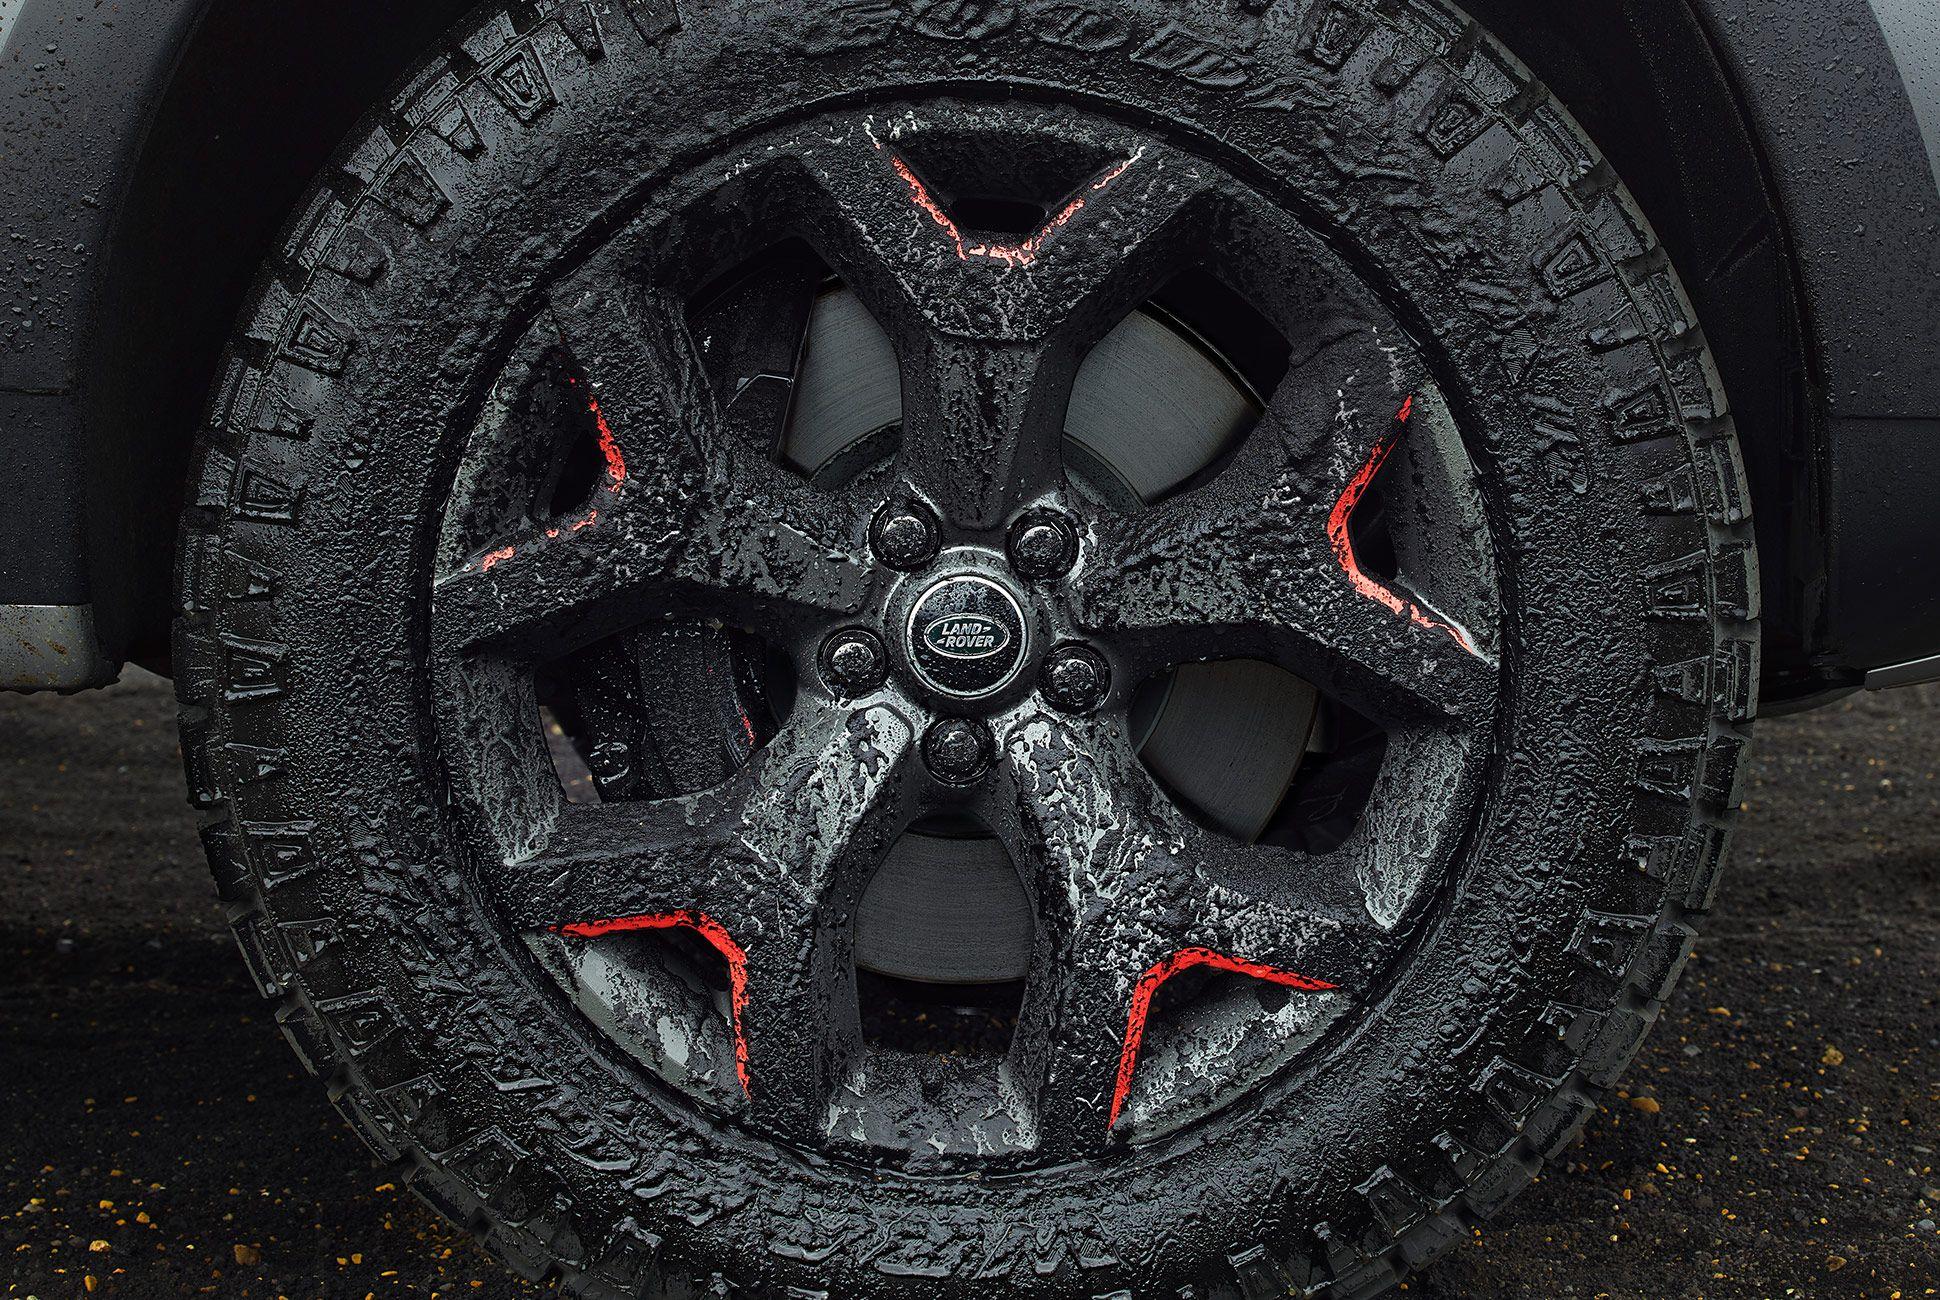 Land-Rover-Discovery-SVX-gear-patrol-5